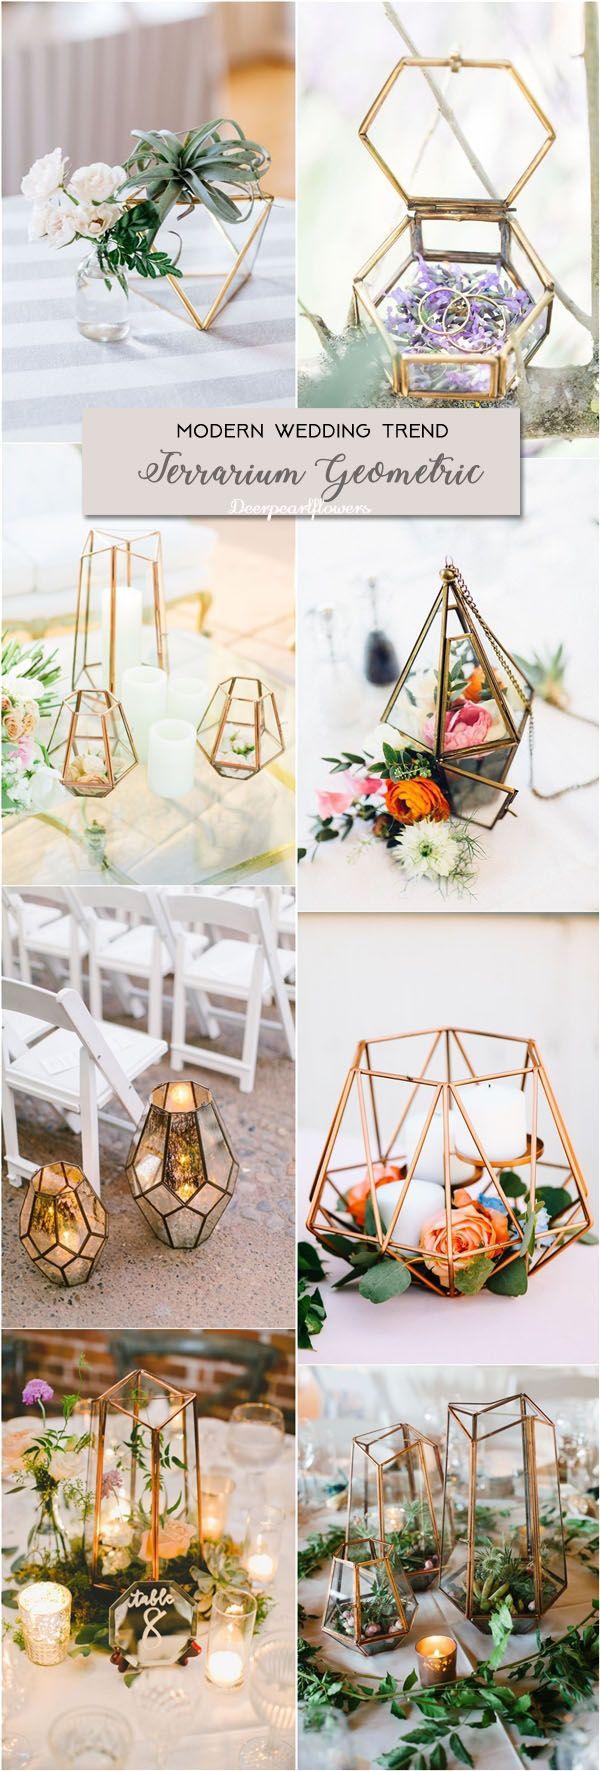 Top 8 Modern Wedding Theme Ideas For 2017